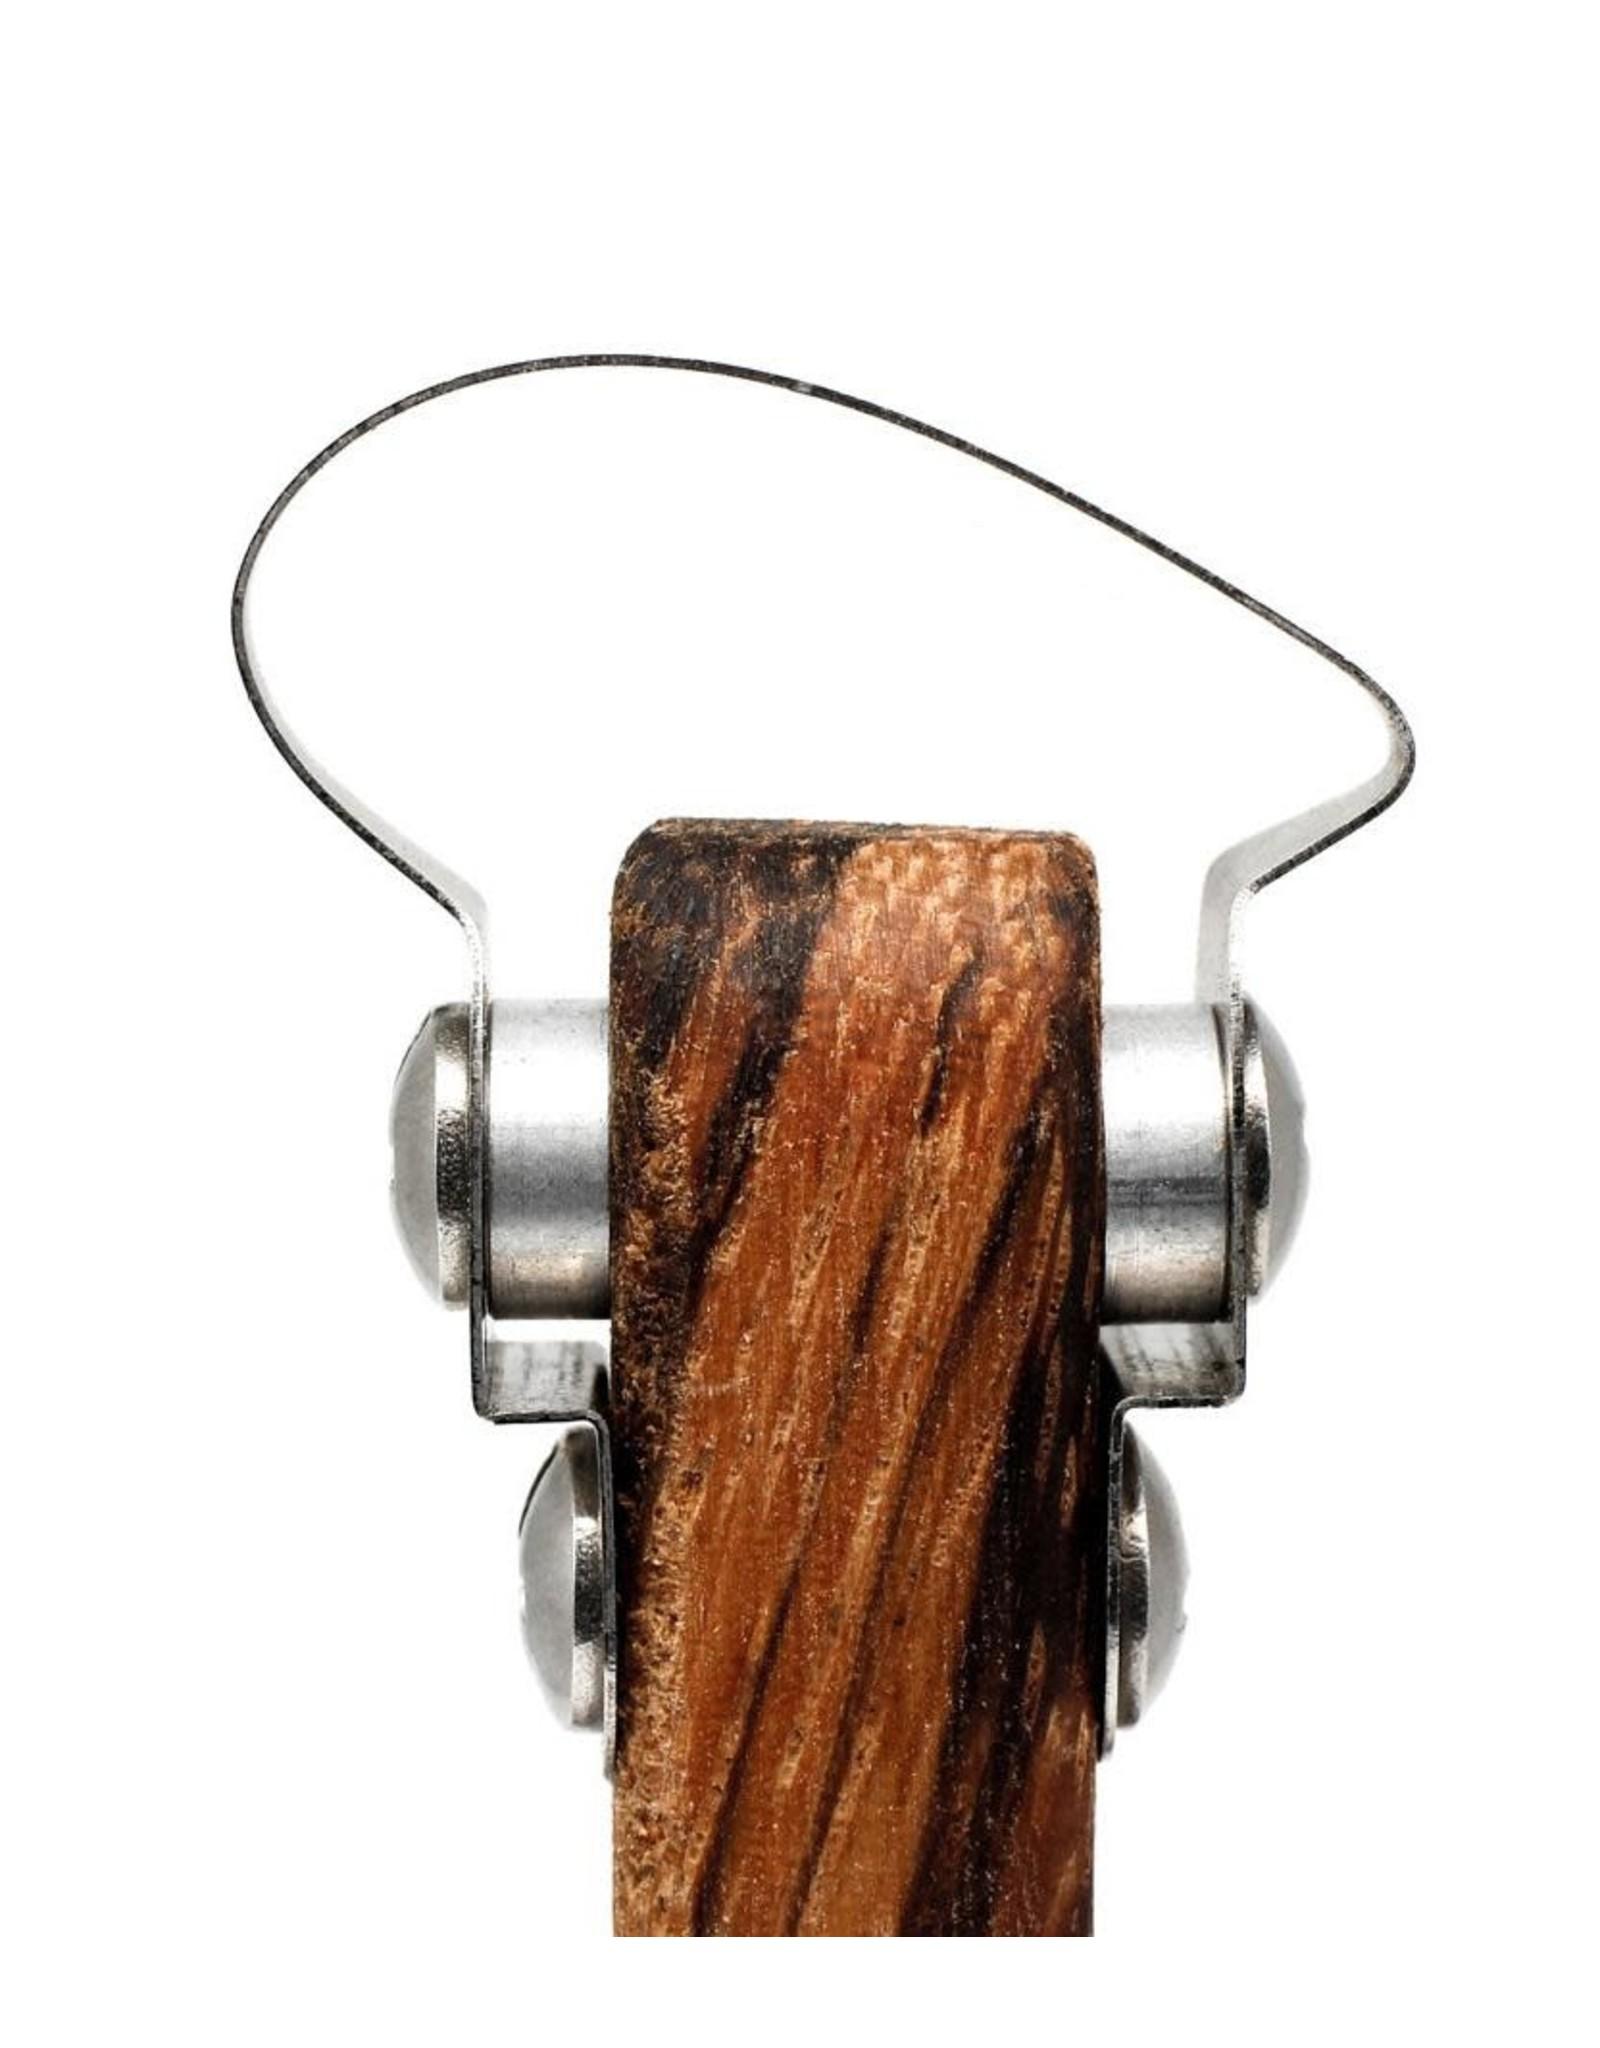 Diamond Core Tools Avocado Trimming Tool w/ Flat Round Handle (T7)